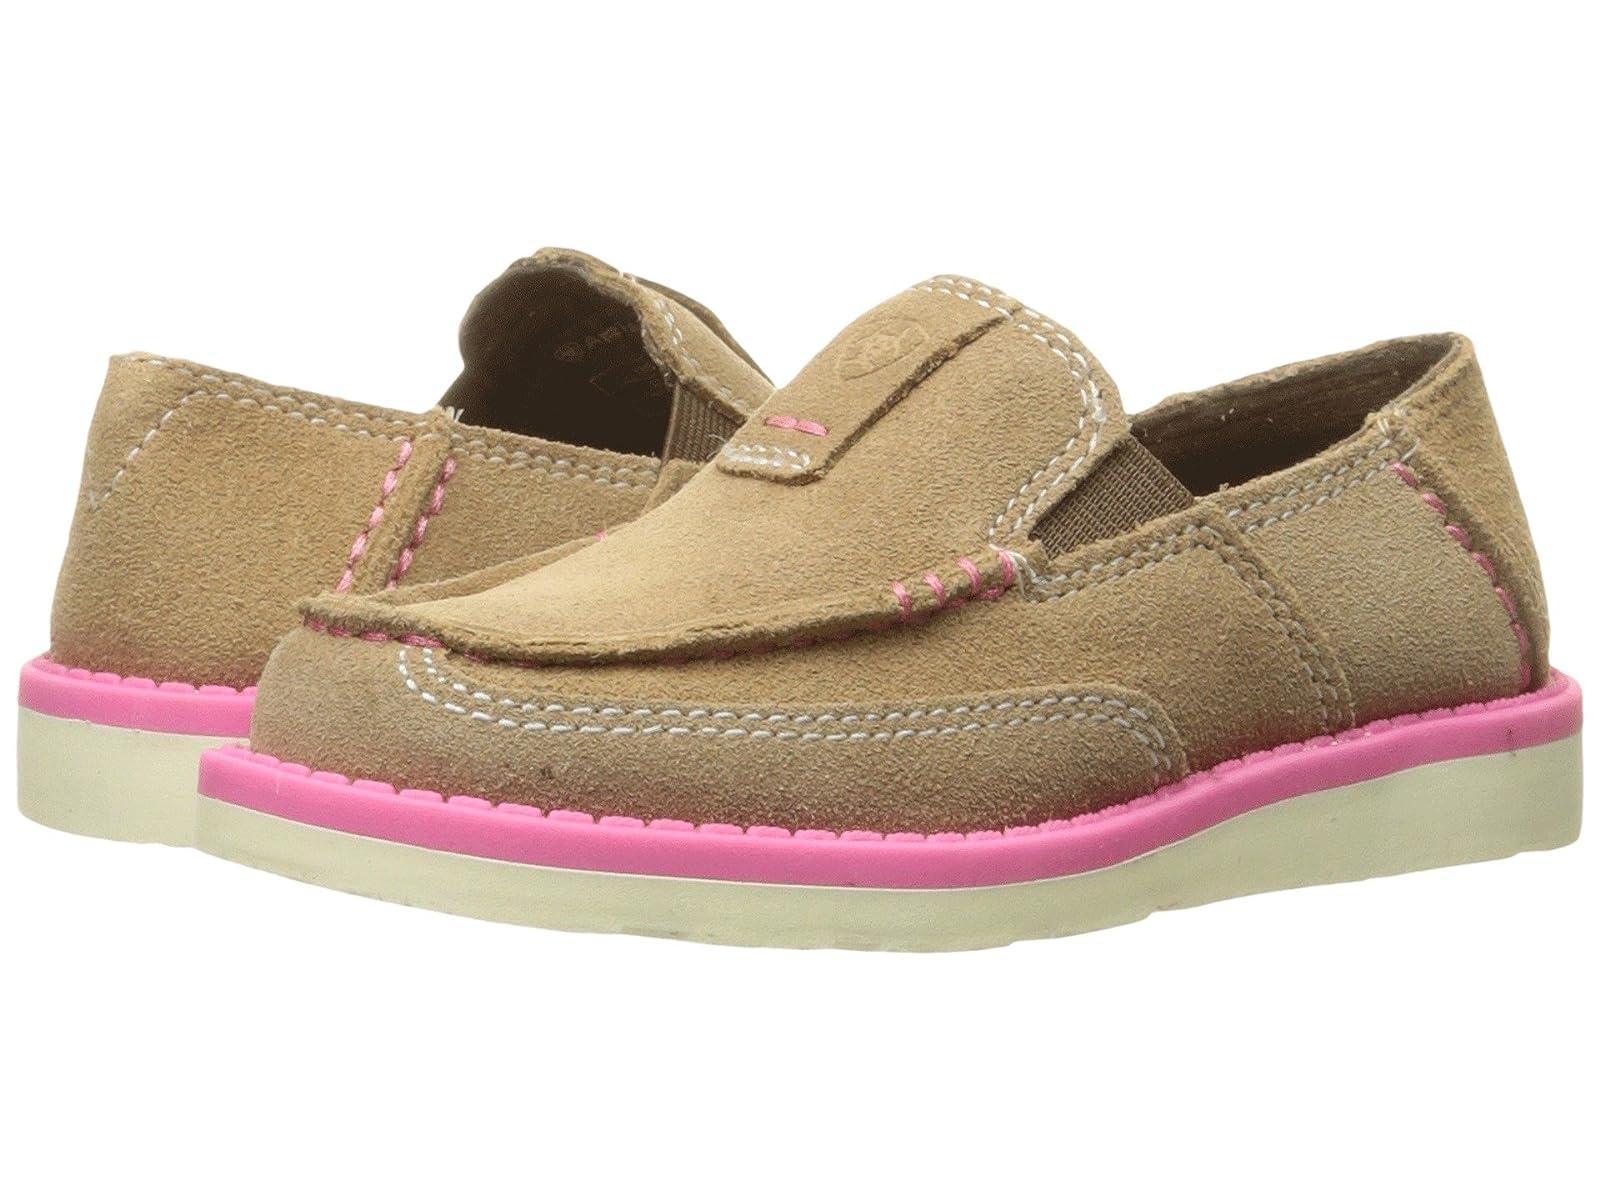 Ariat Kids Cruiser (Toddler/Little Kid/Big Kid)Cheap and distinctive eye-catching shoes